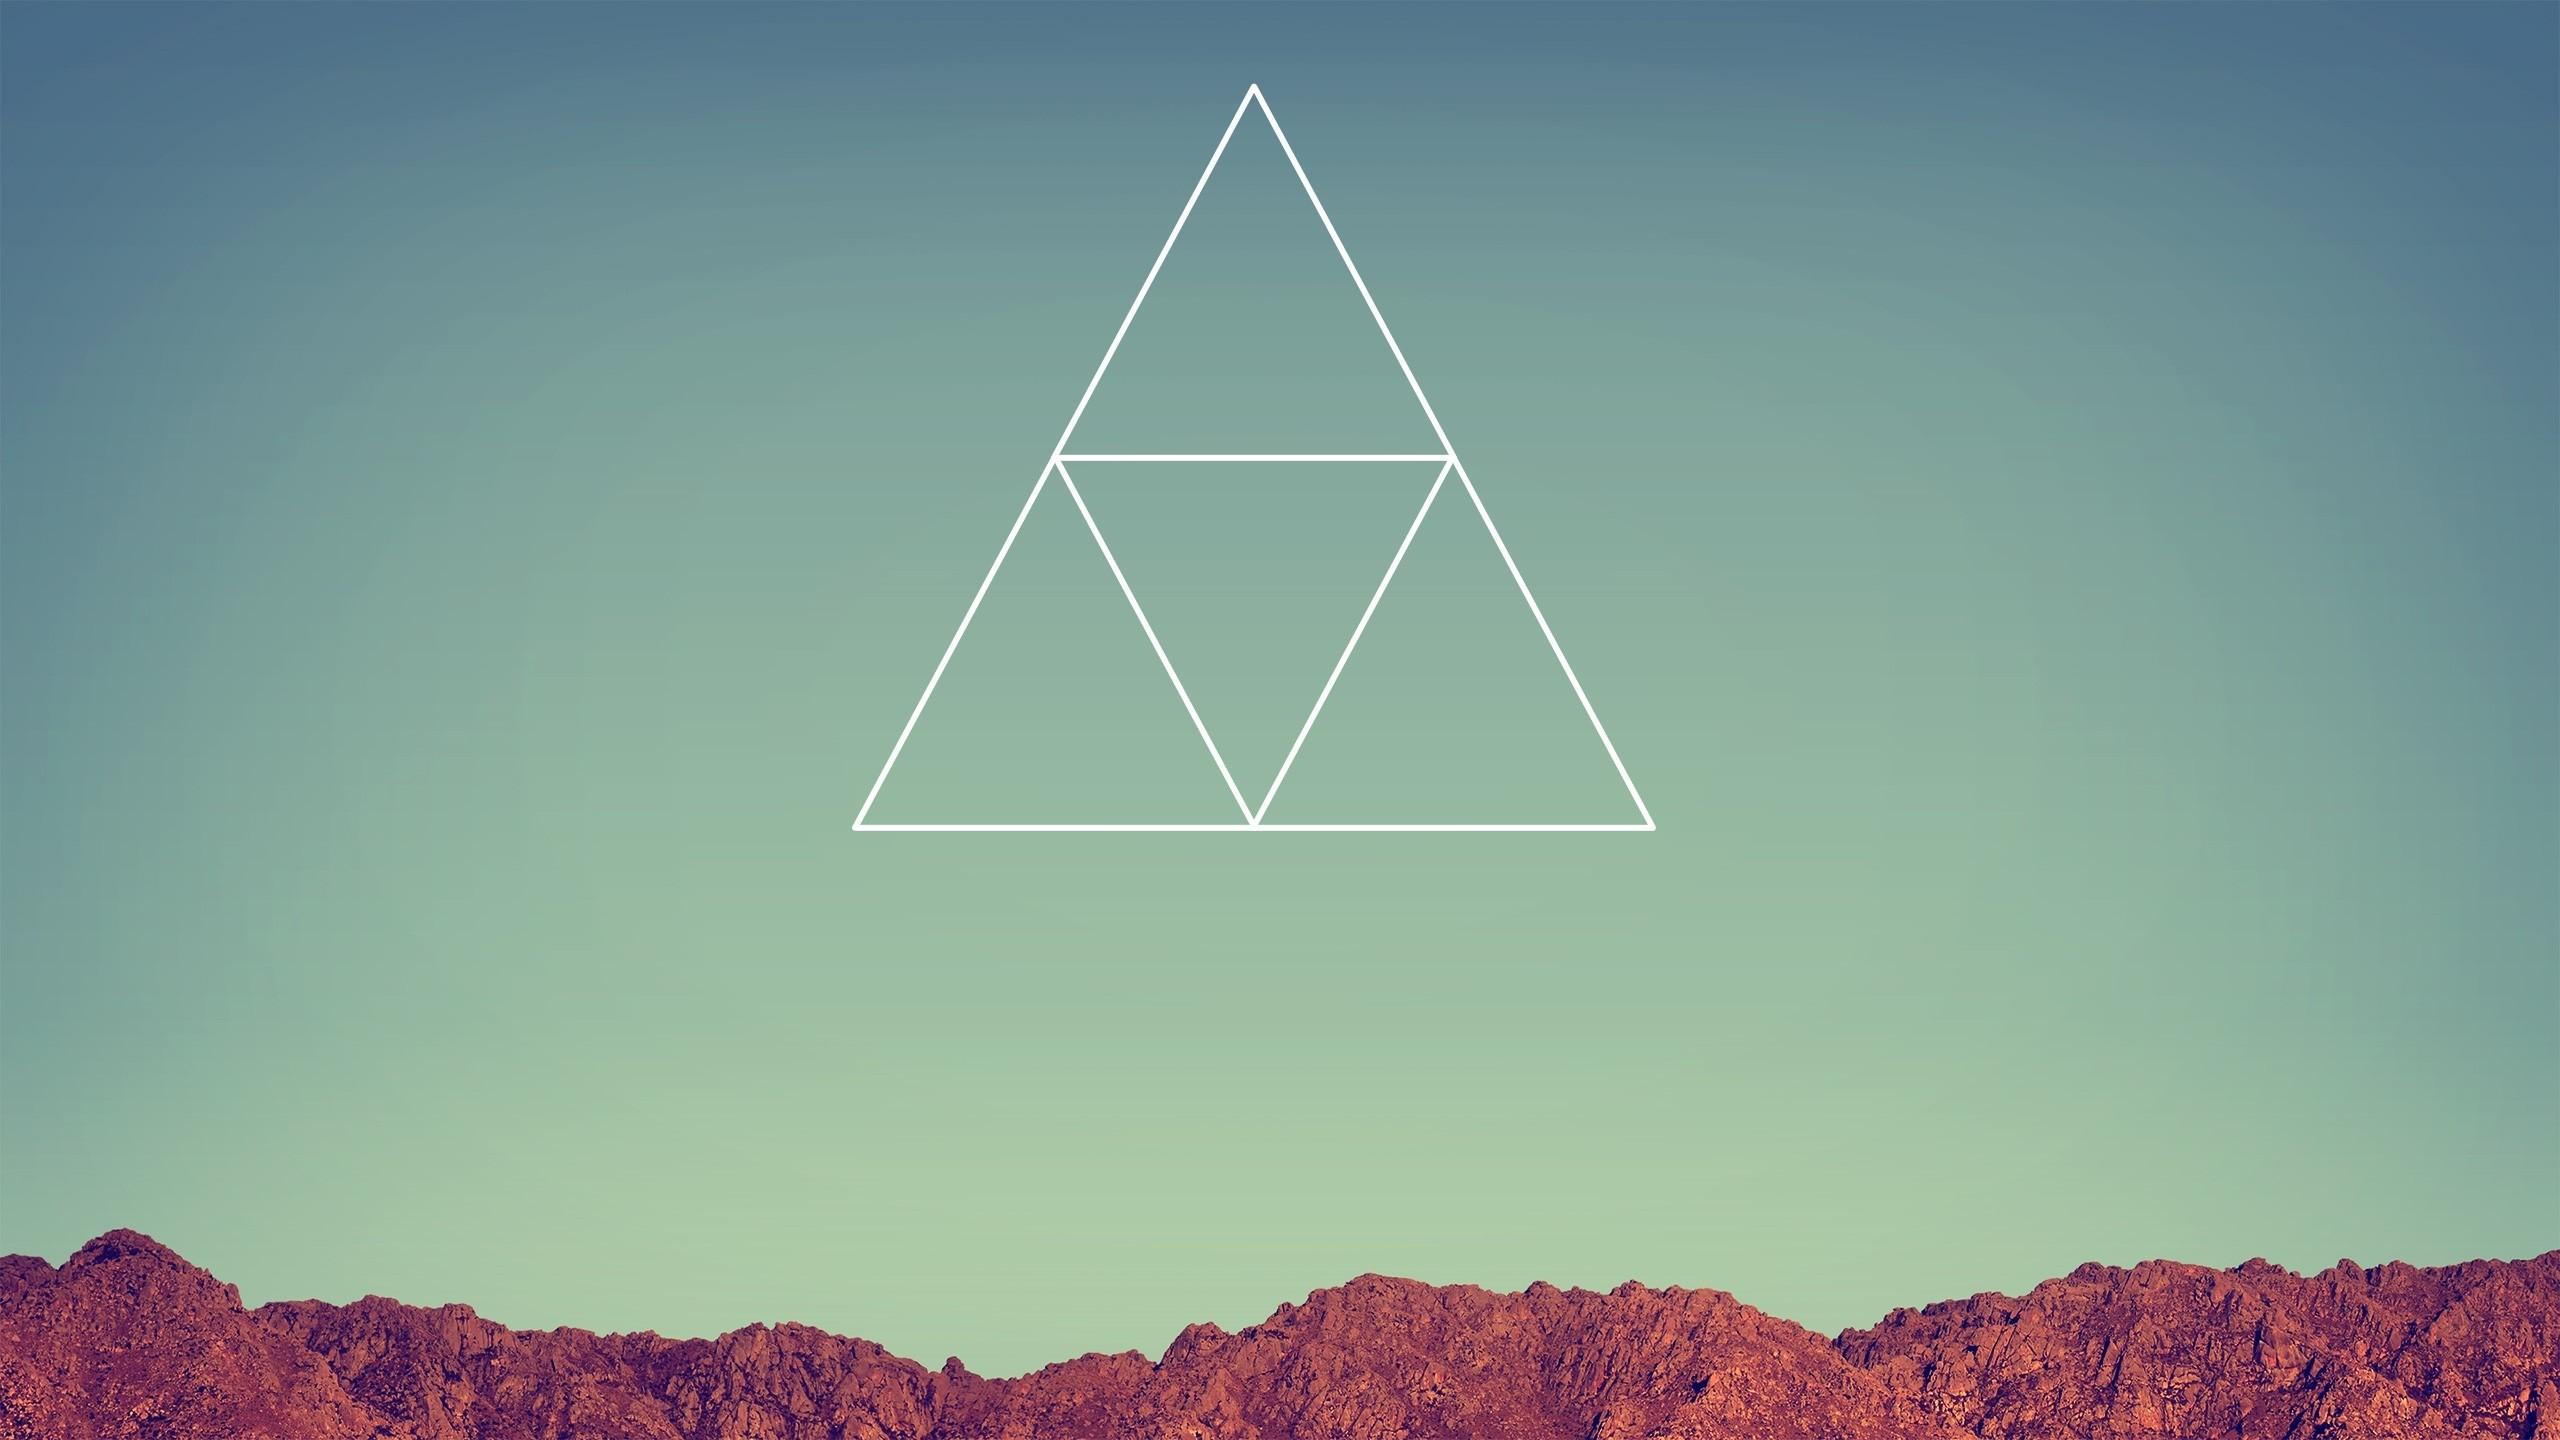 Hipster Triangle Wallpaper HD For Desktop